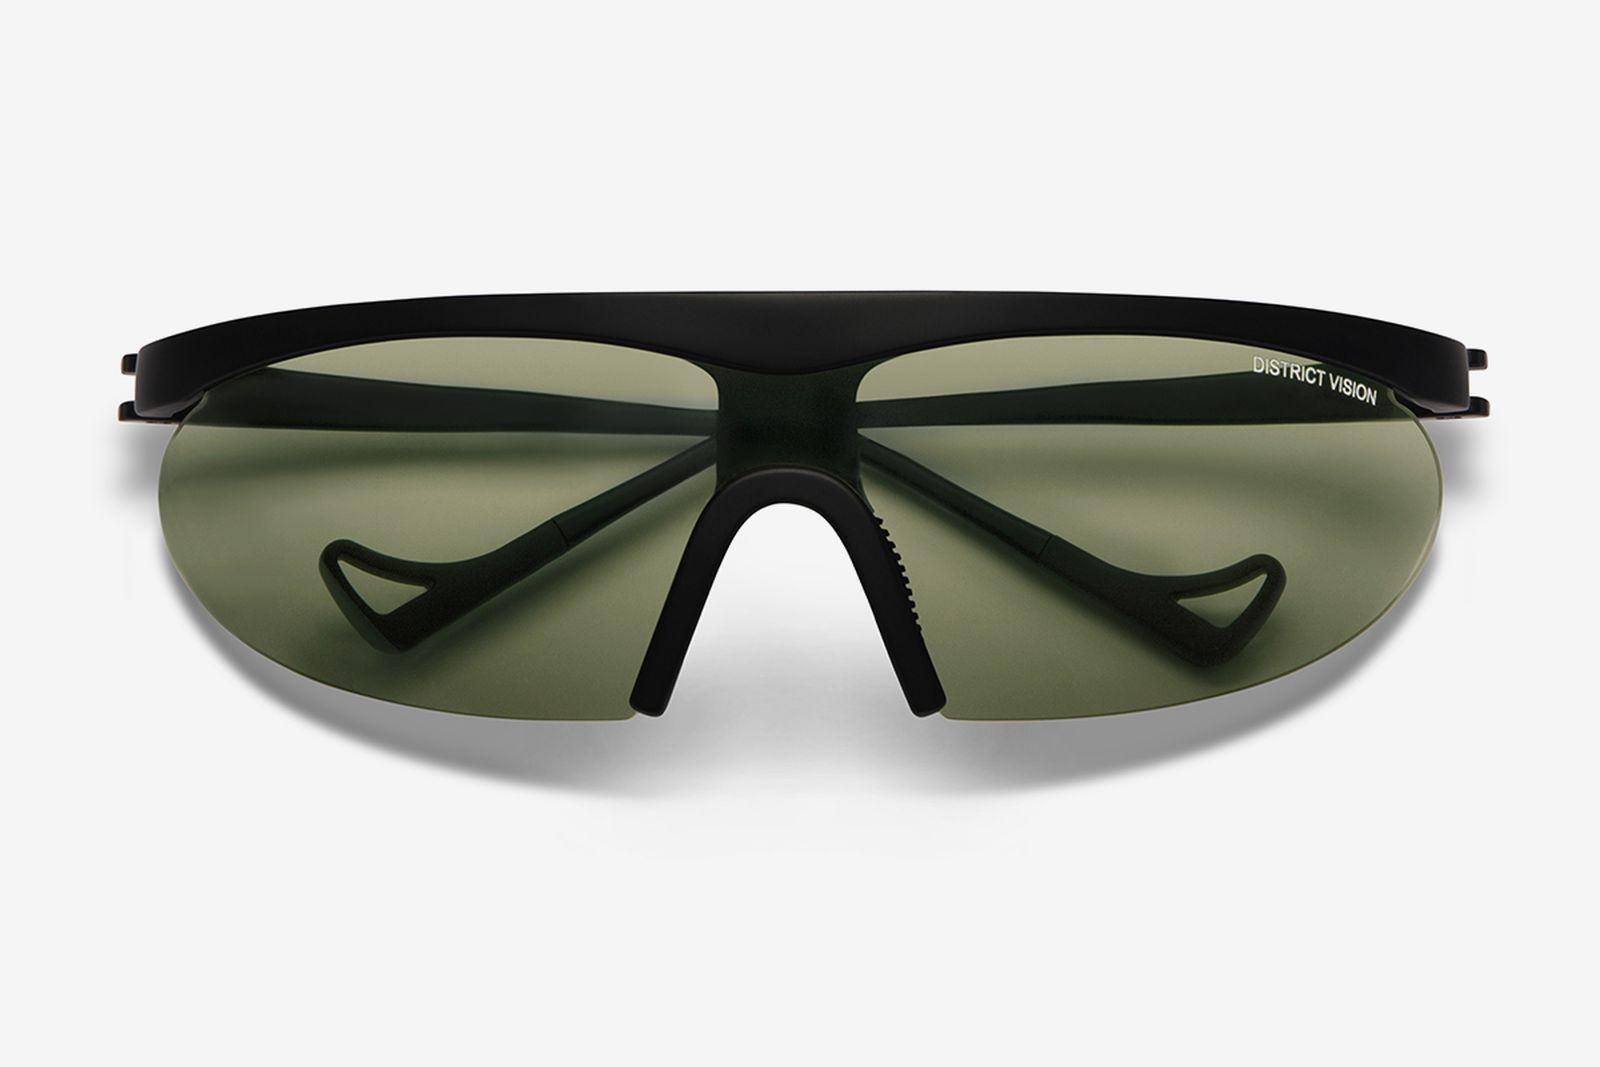 district vision koharu eclipse sunglasses